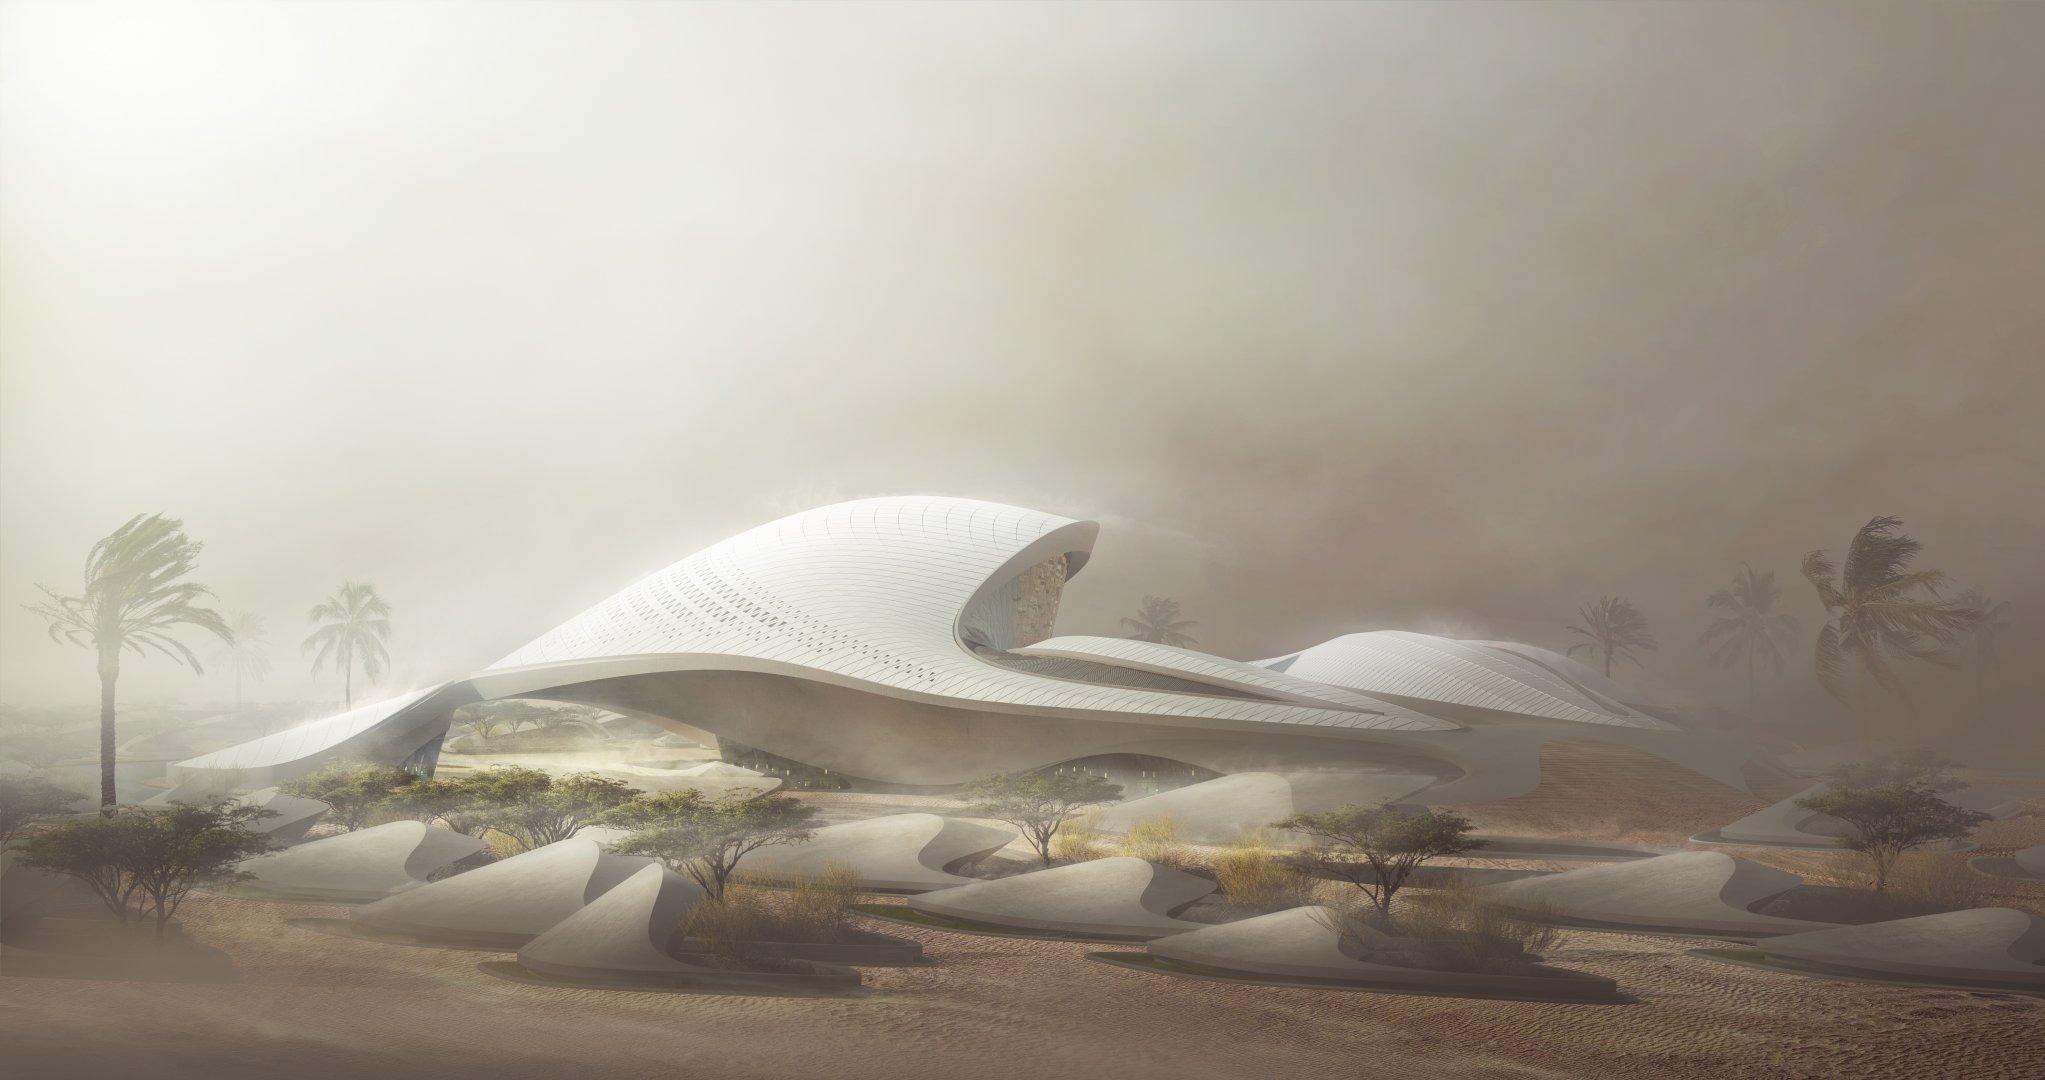 Zaha Hadid 39 S 39 Field Of Sand Dunes 39 For Uae Environmental